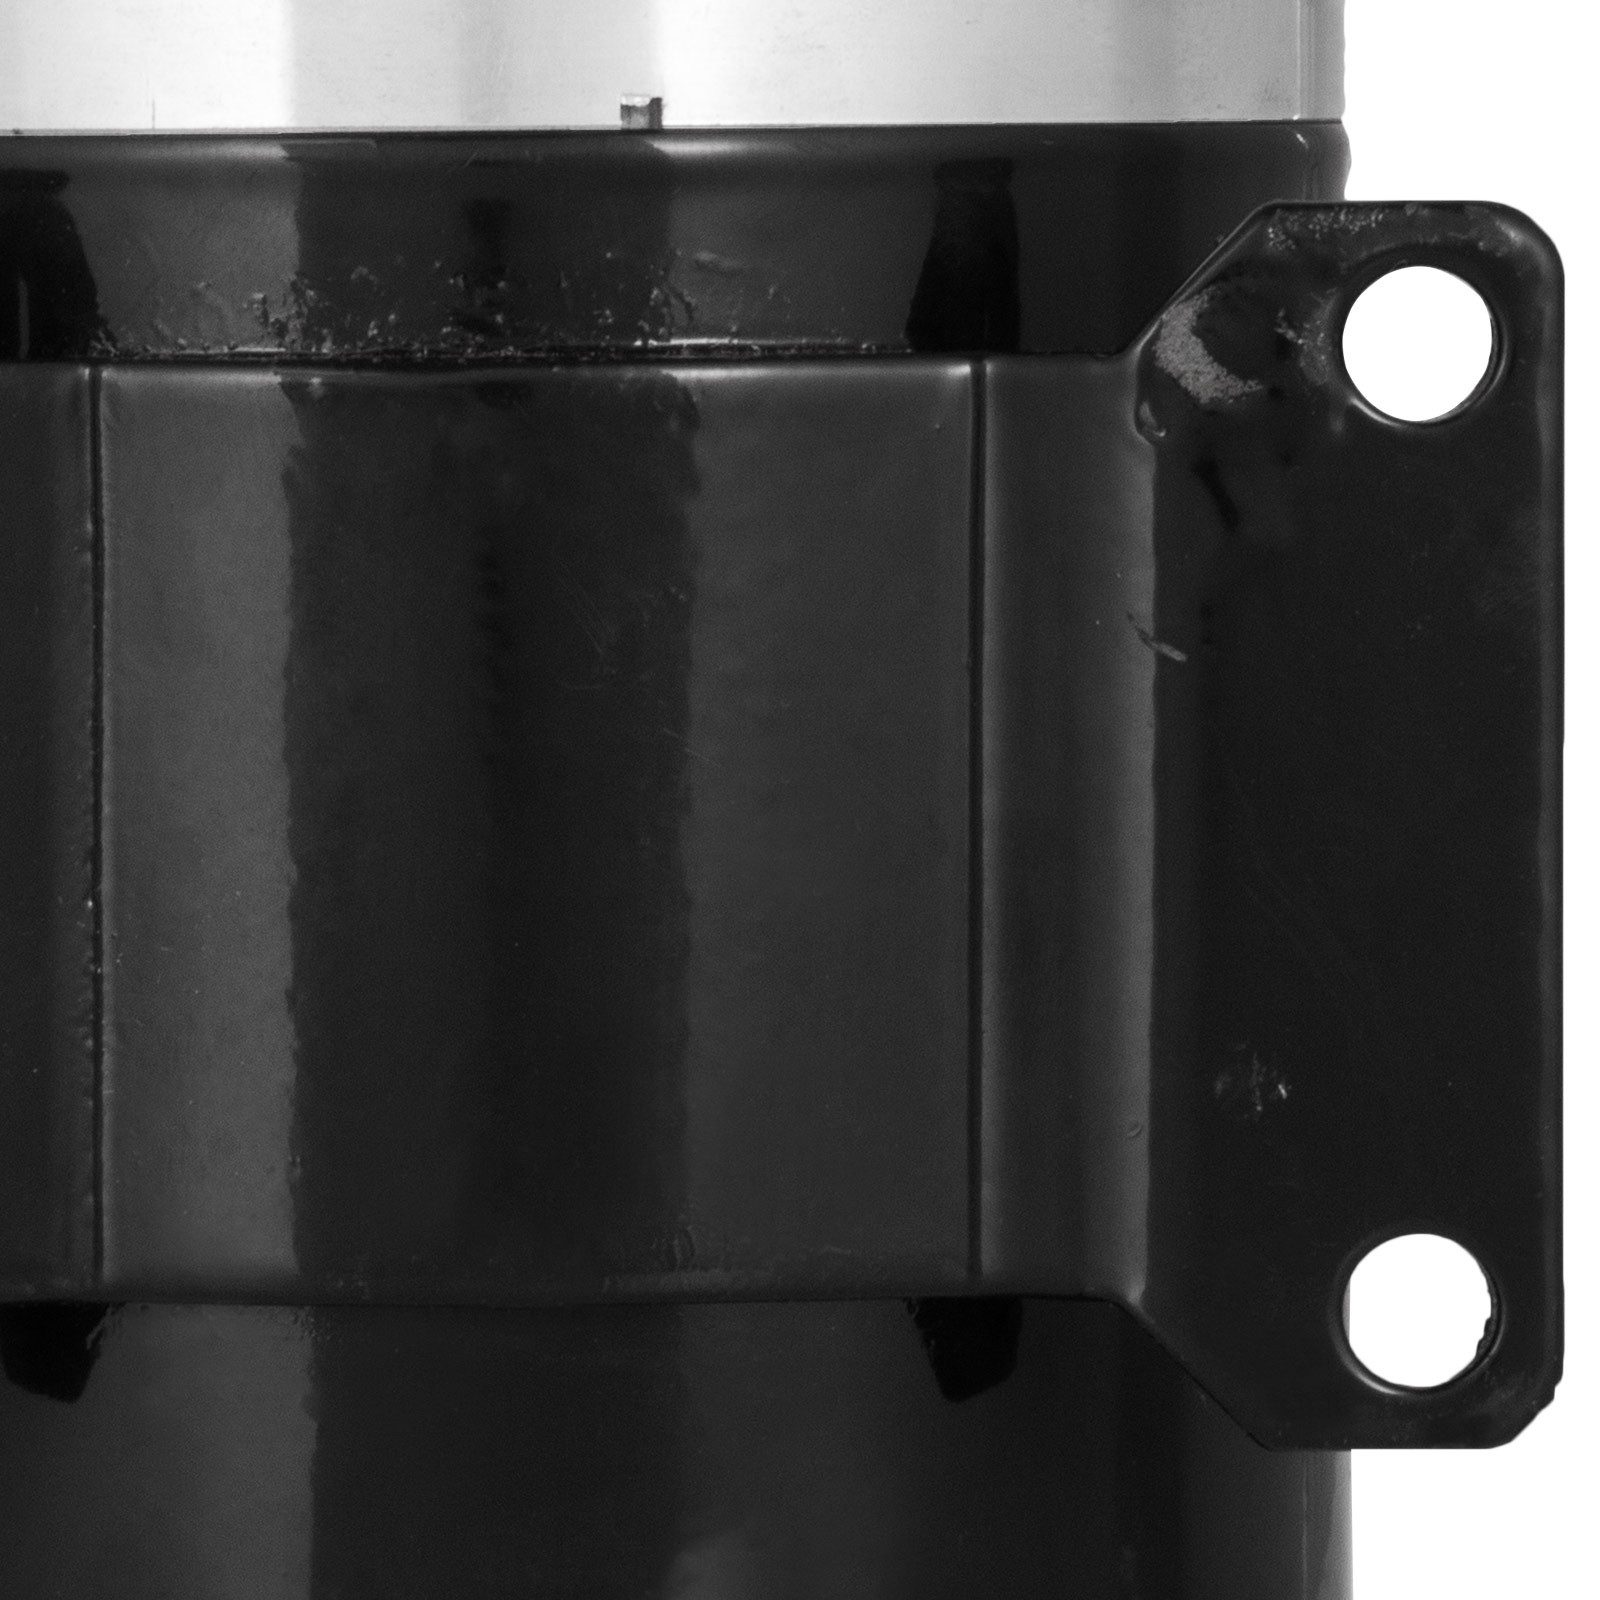 36v-Electric-Motor-controller-throttle-kit-f-Scooter-E-Scooter-ATV-Permanent thumbnail 79